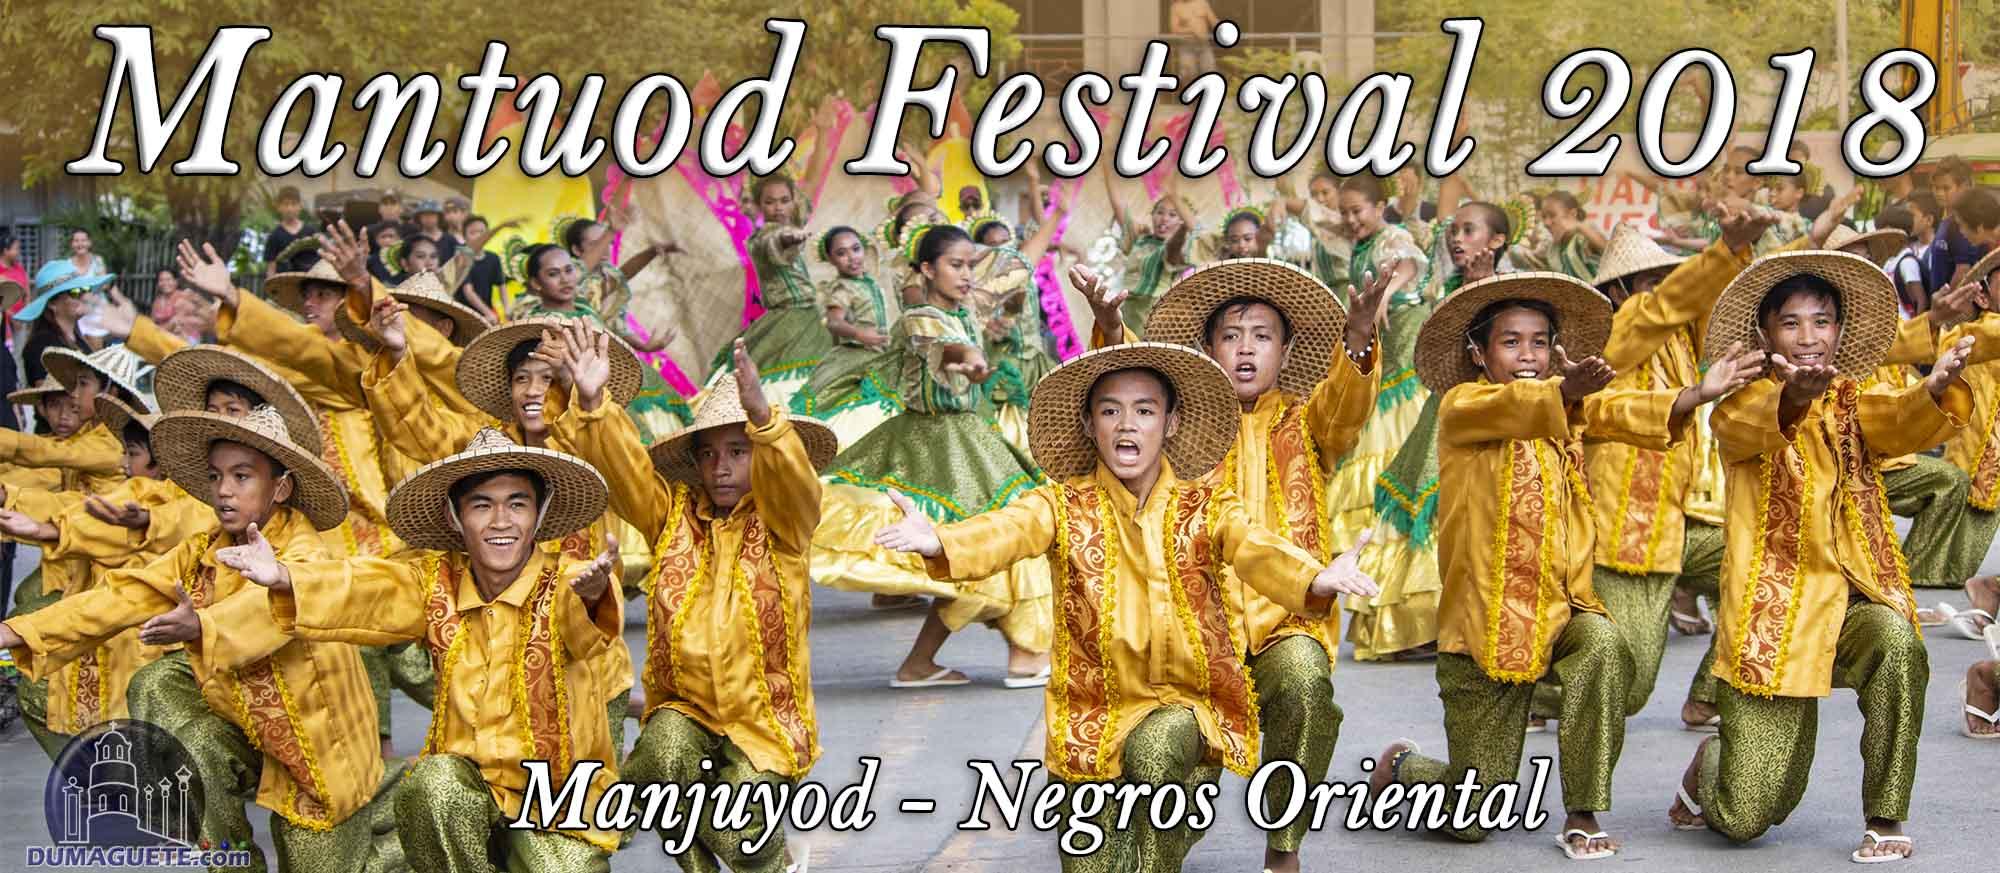 Mantuod Festival 2018 - Manjuyod - Negros Oriental